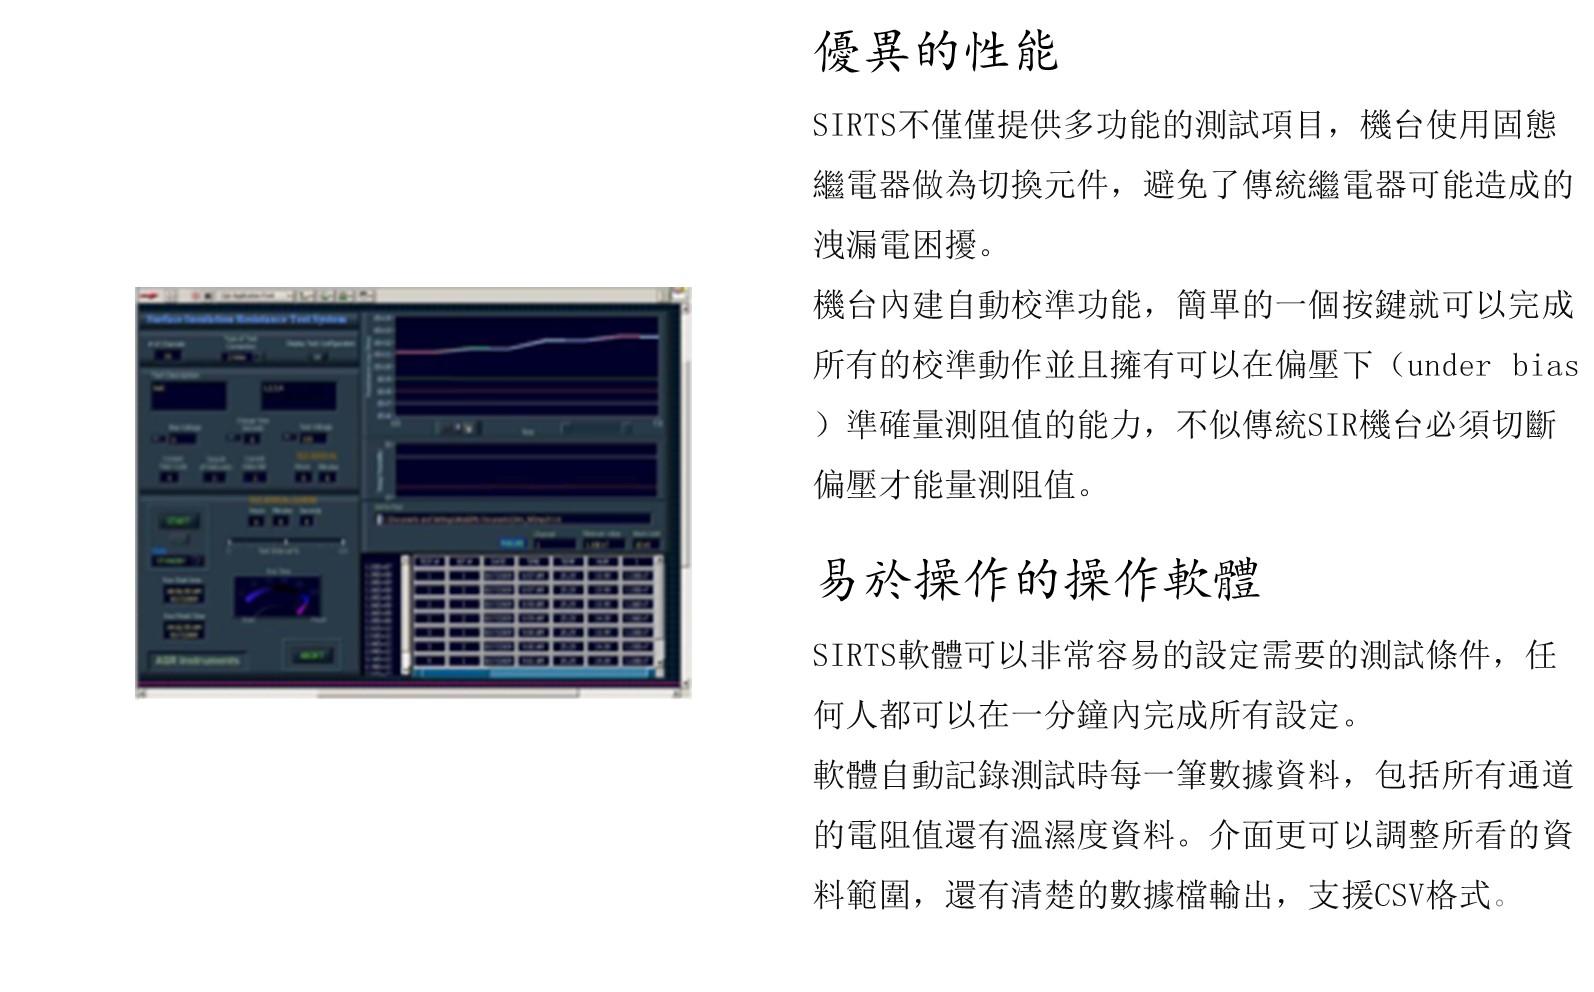 ASR SIRTS 離子遷移_ASR CAF/SIR絕緣阻抗測試設備_產品中心_得邁斯儀器股份有限公司